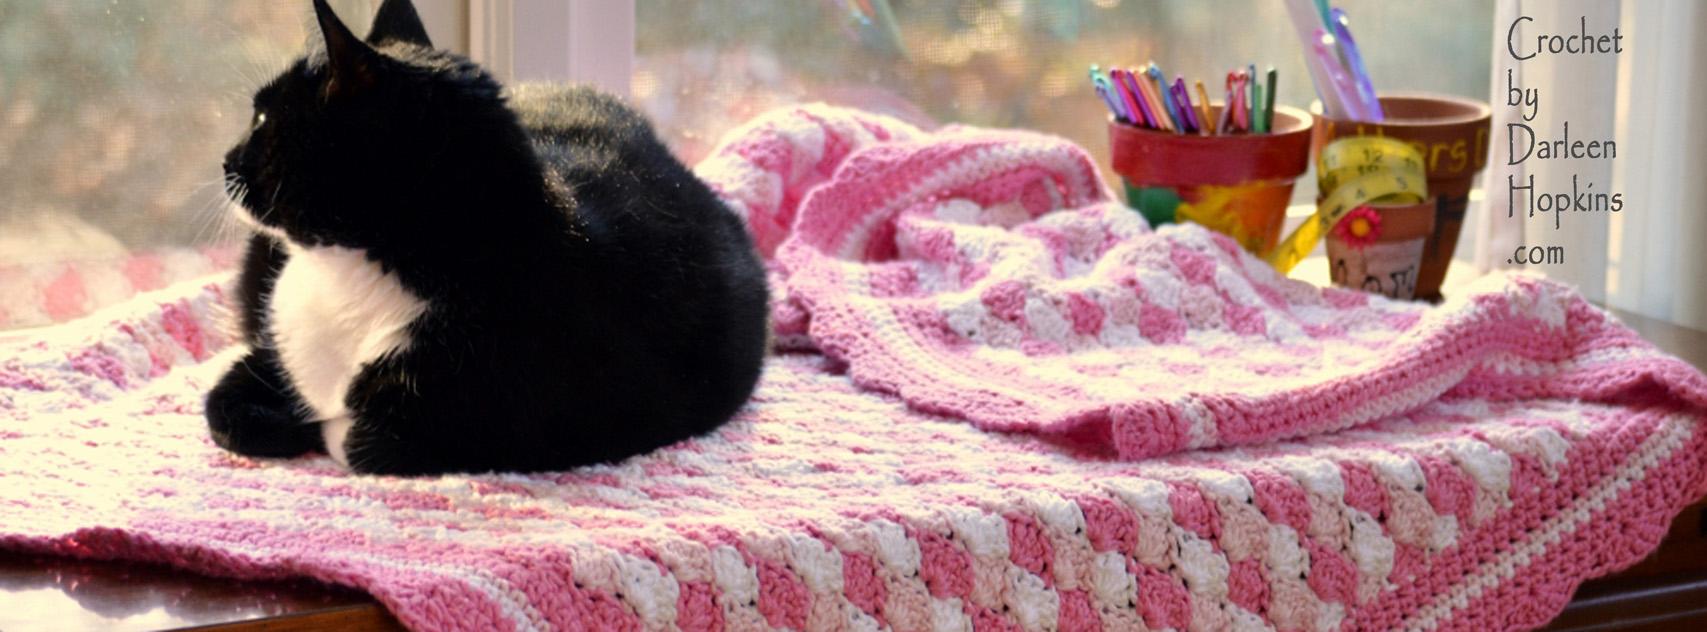 Shells of Love baby blanket crochet pattern by Darleen Hopkins